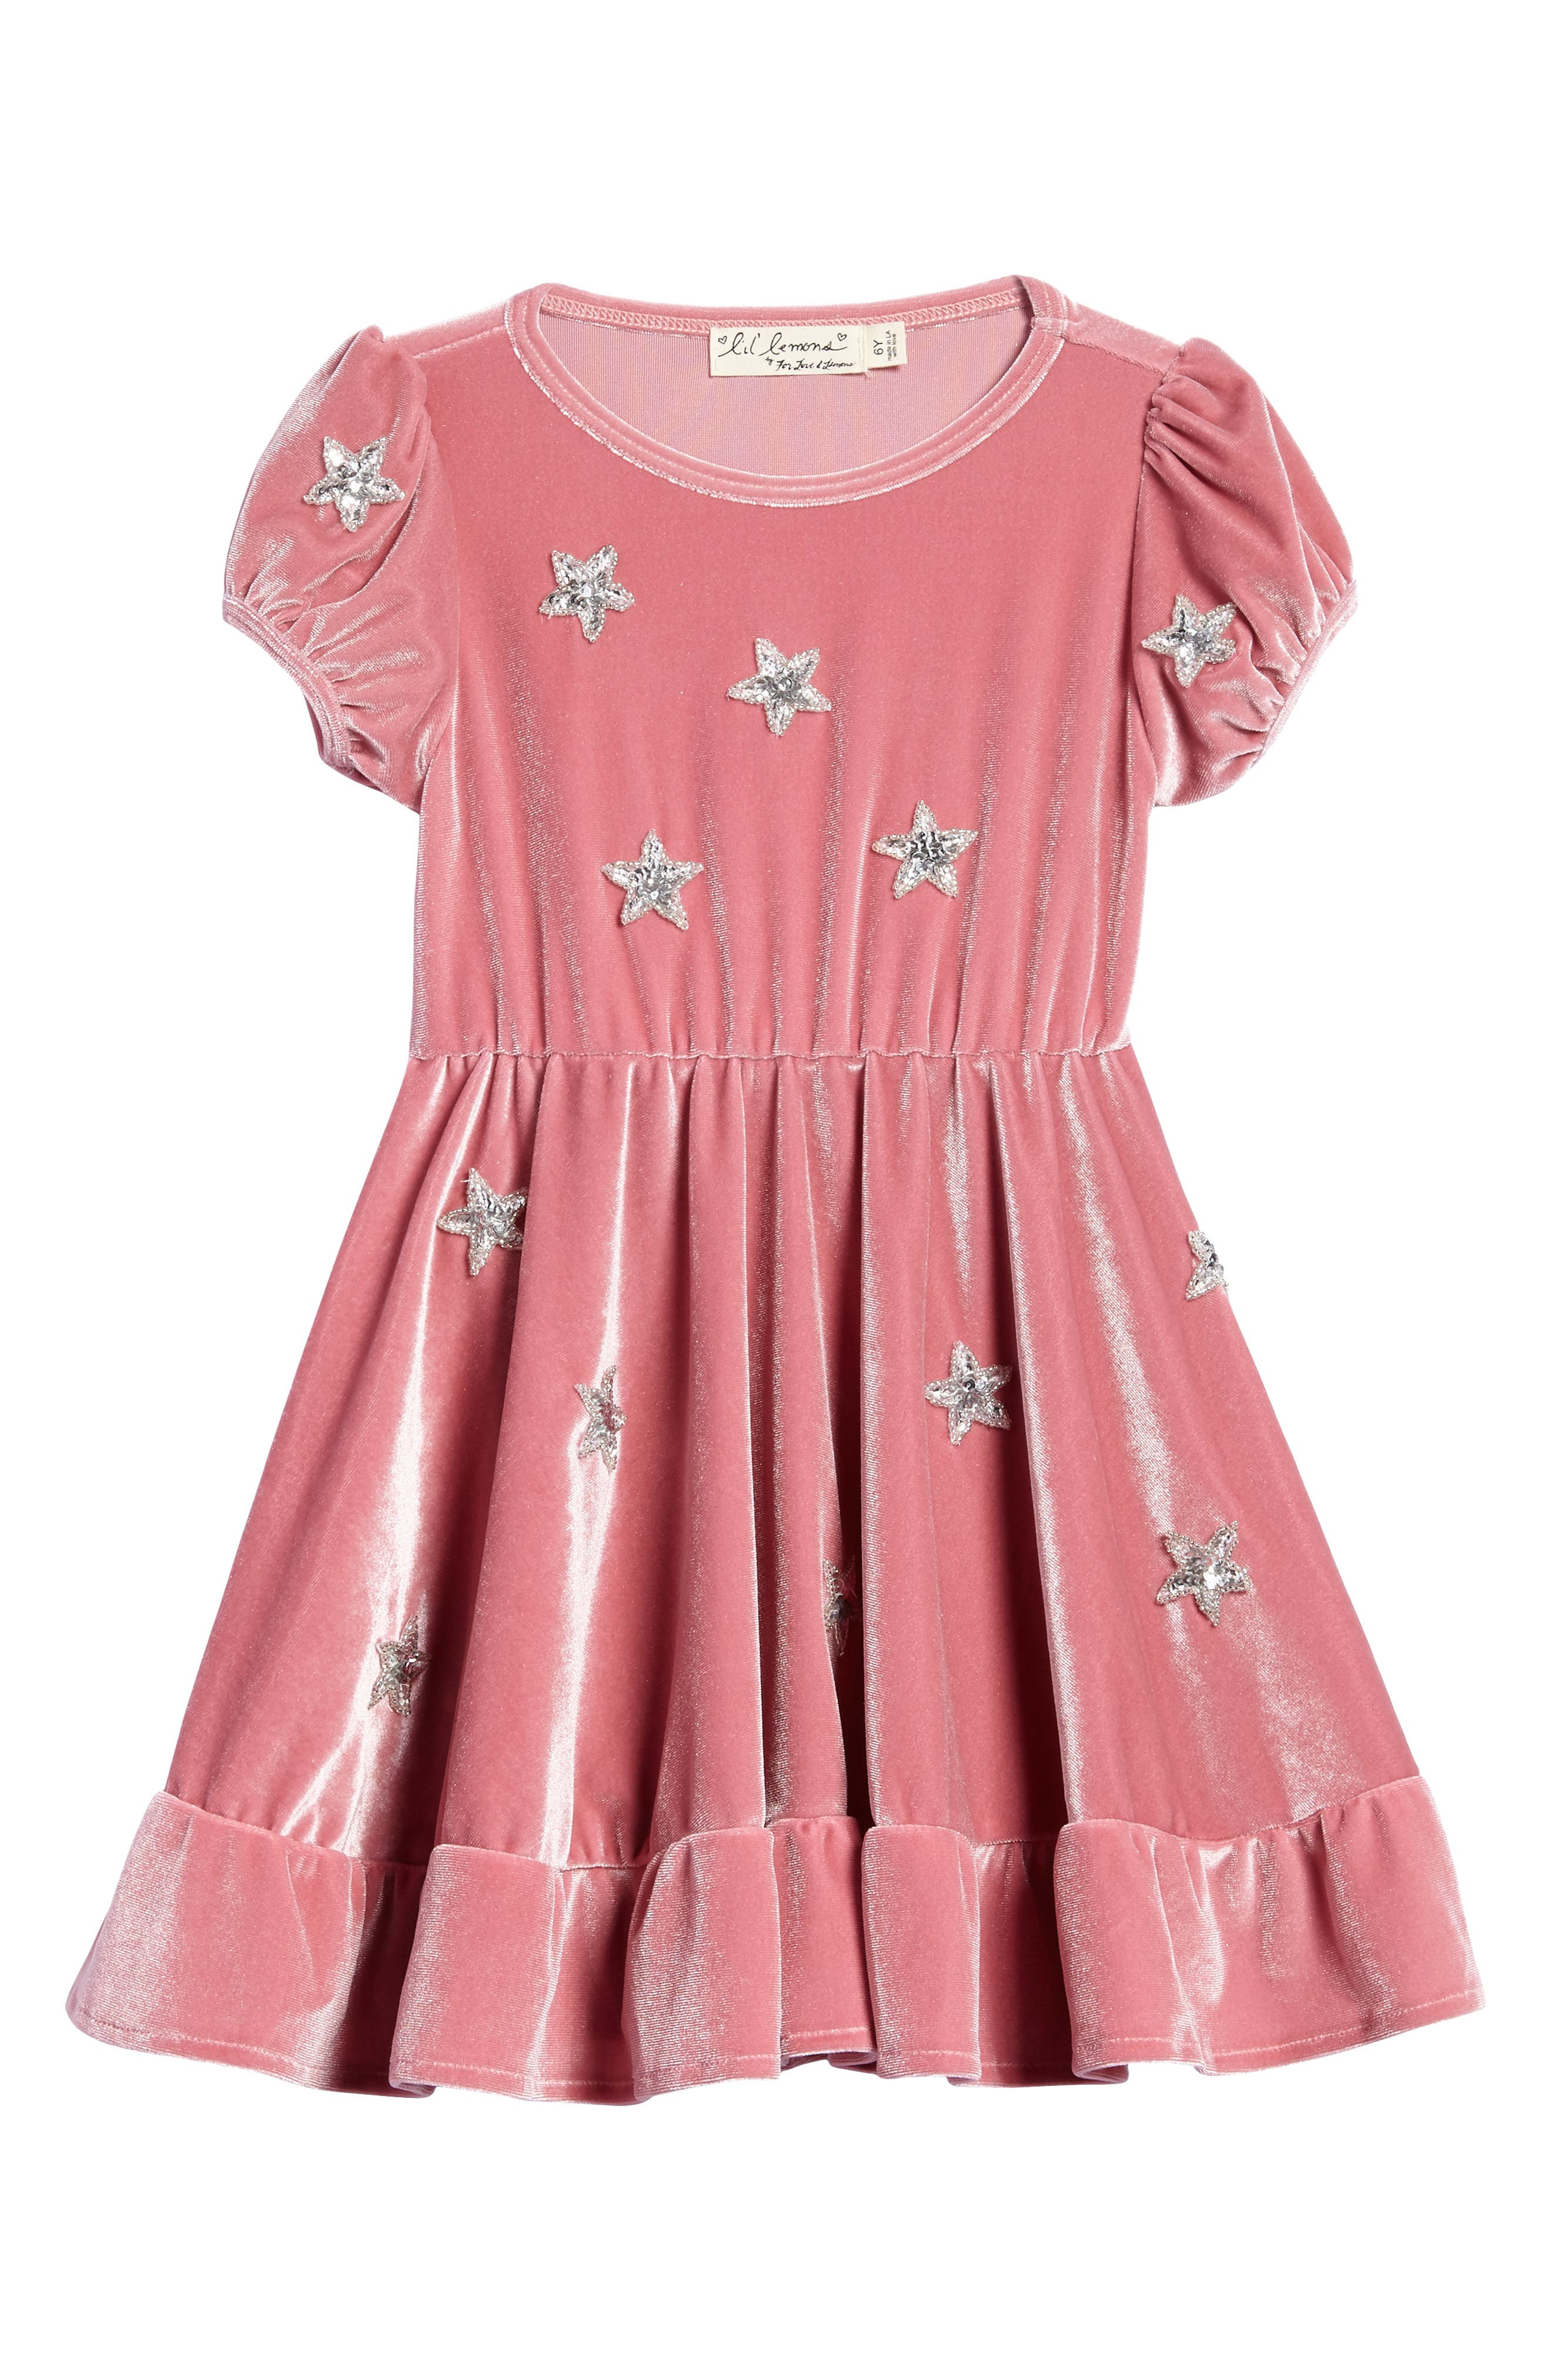 North Star Velvet Dress,                             Main thumbnail 1, color,                             Pomegranate